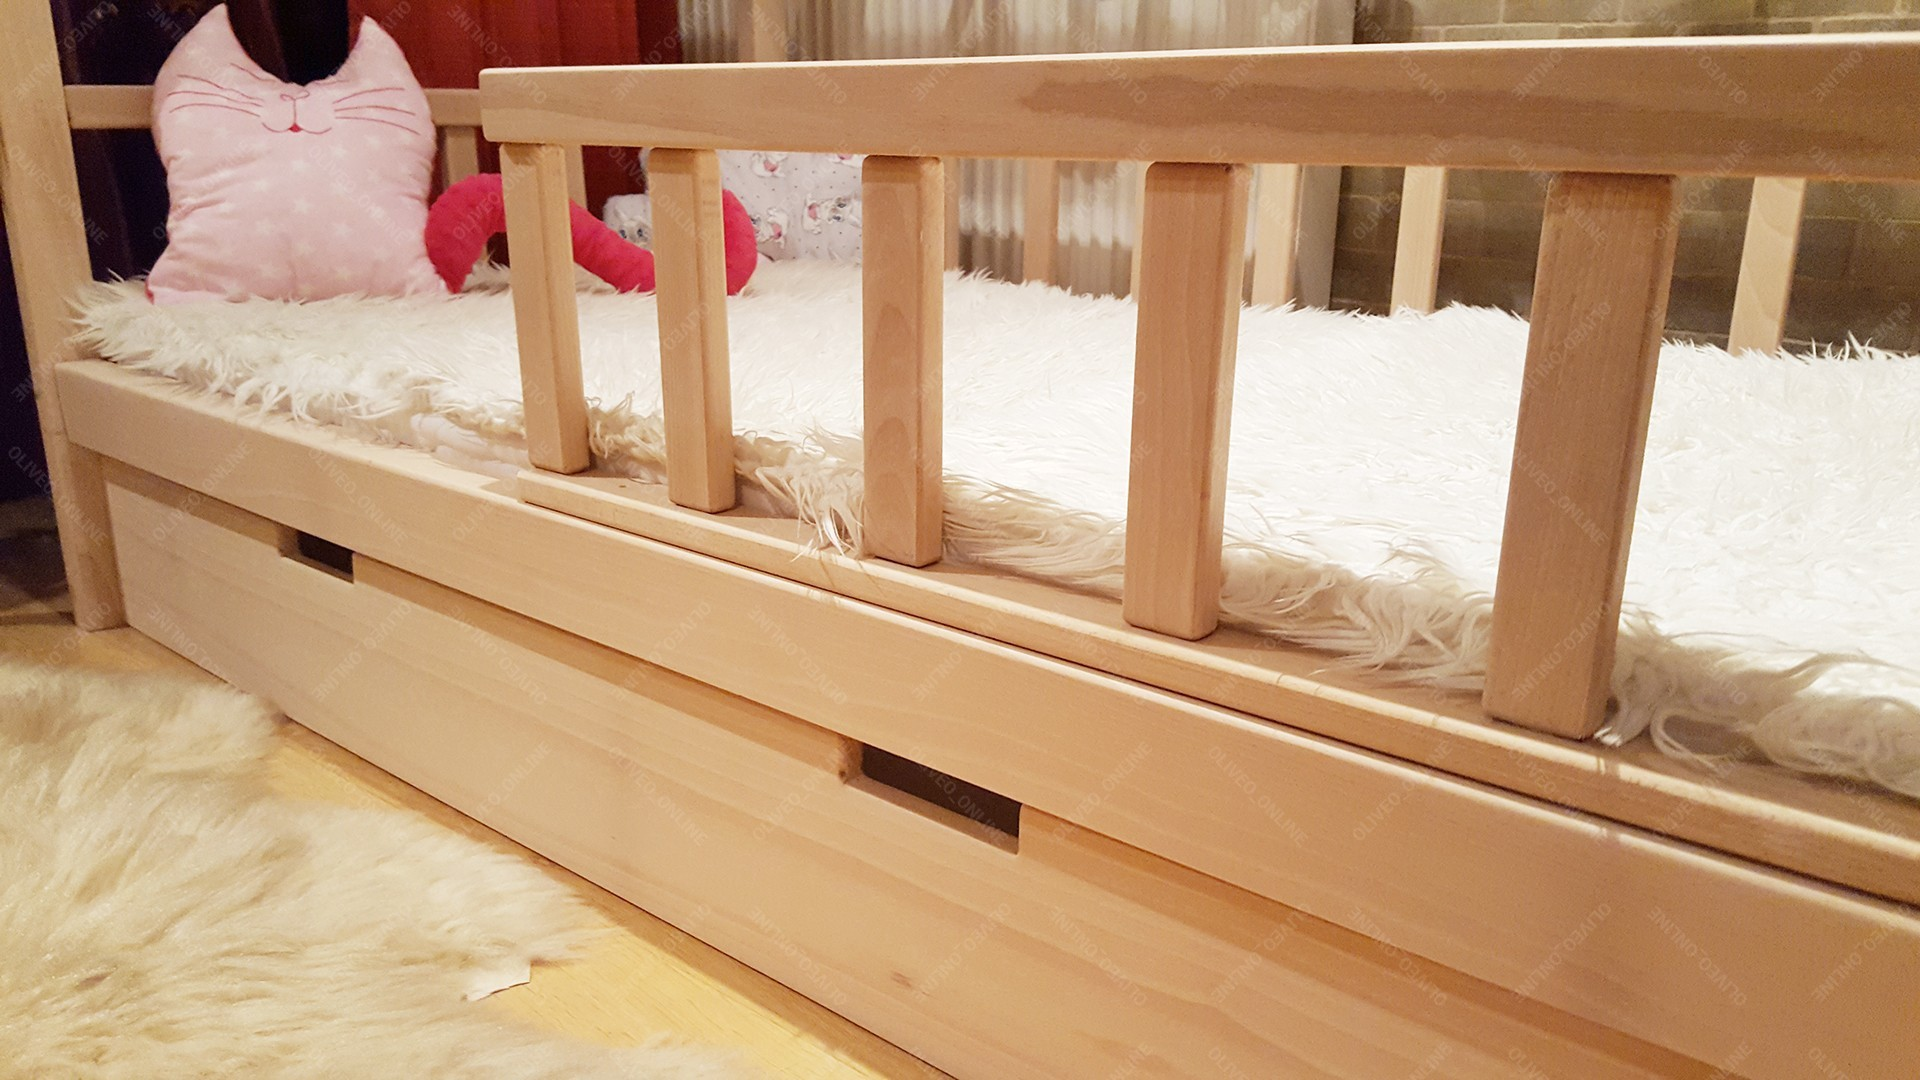 lit cabane bois de h tre 90 x 180cm. Black Bedroom Furniture Sets. Home Design Ideas